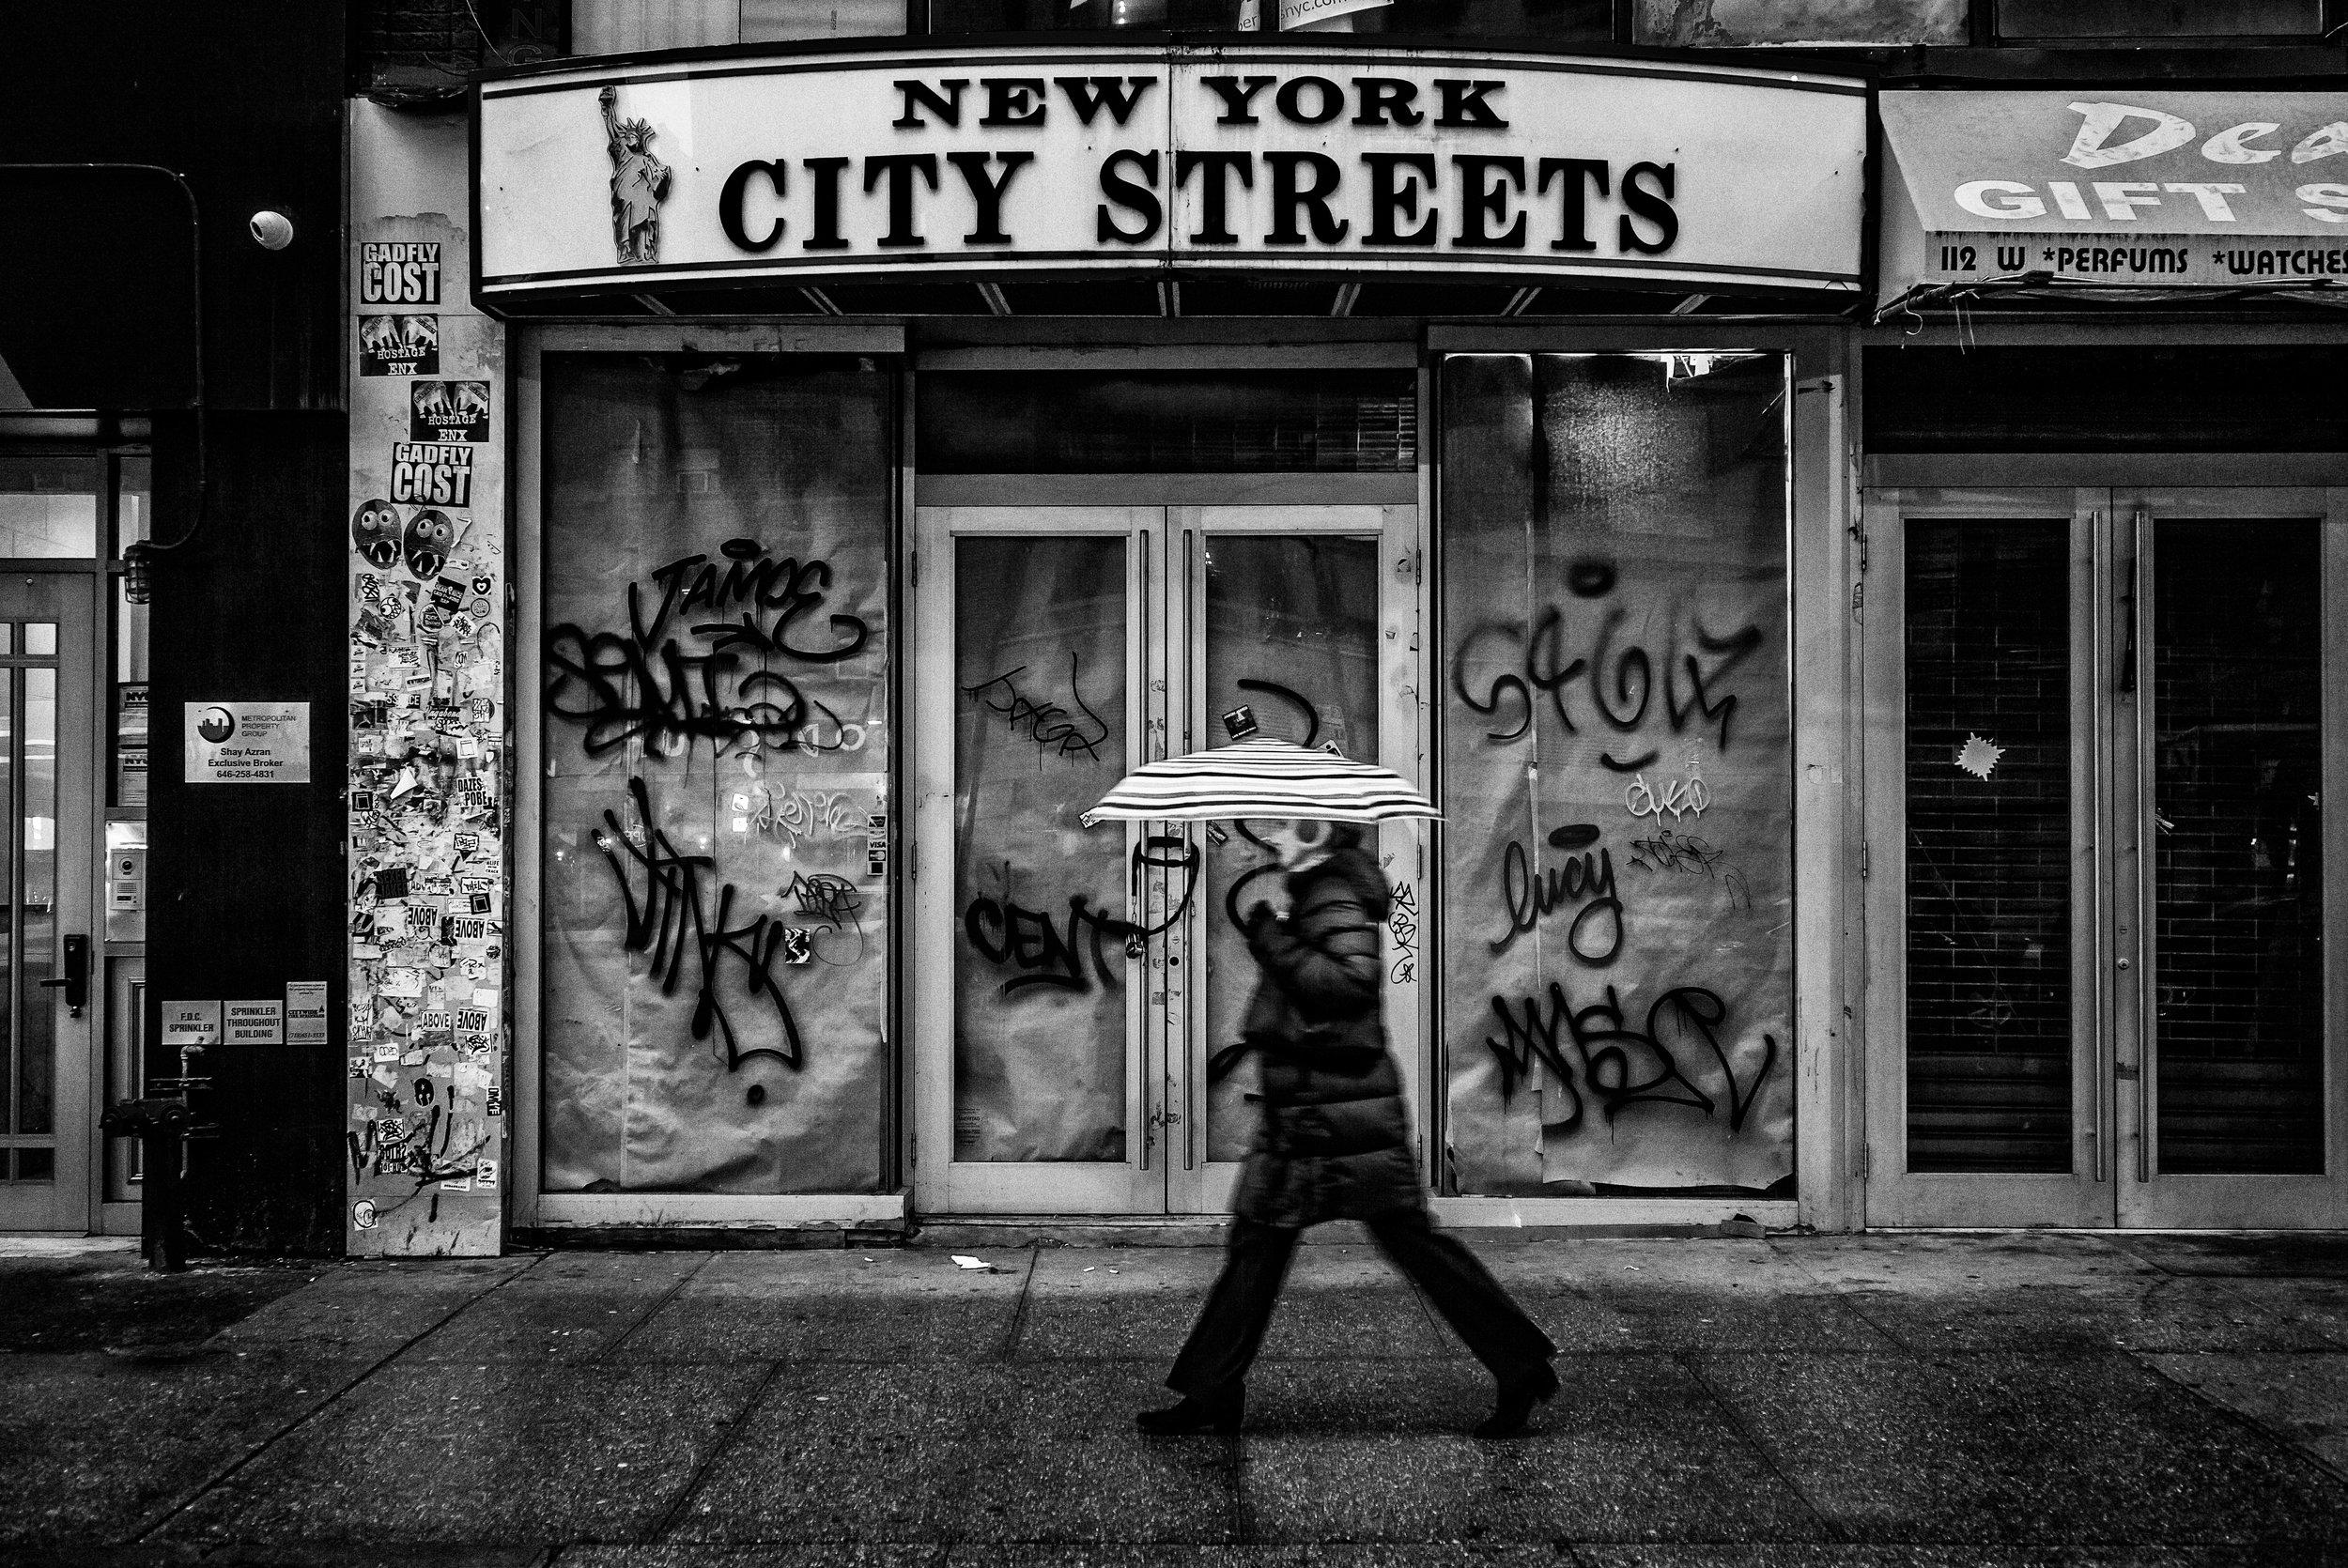 Photo by  jesse williams on  Unsplash